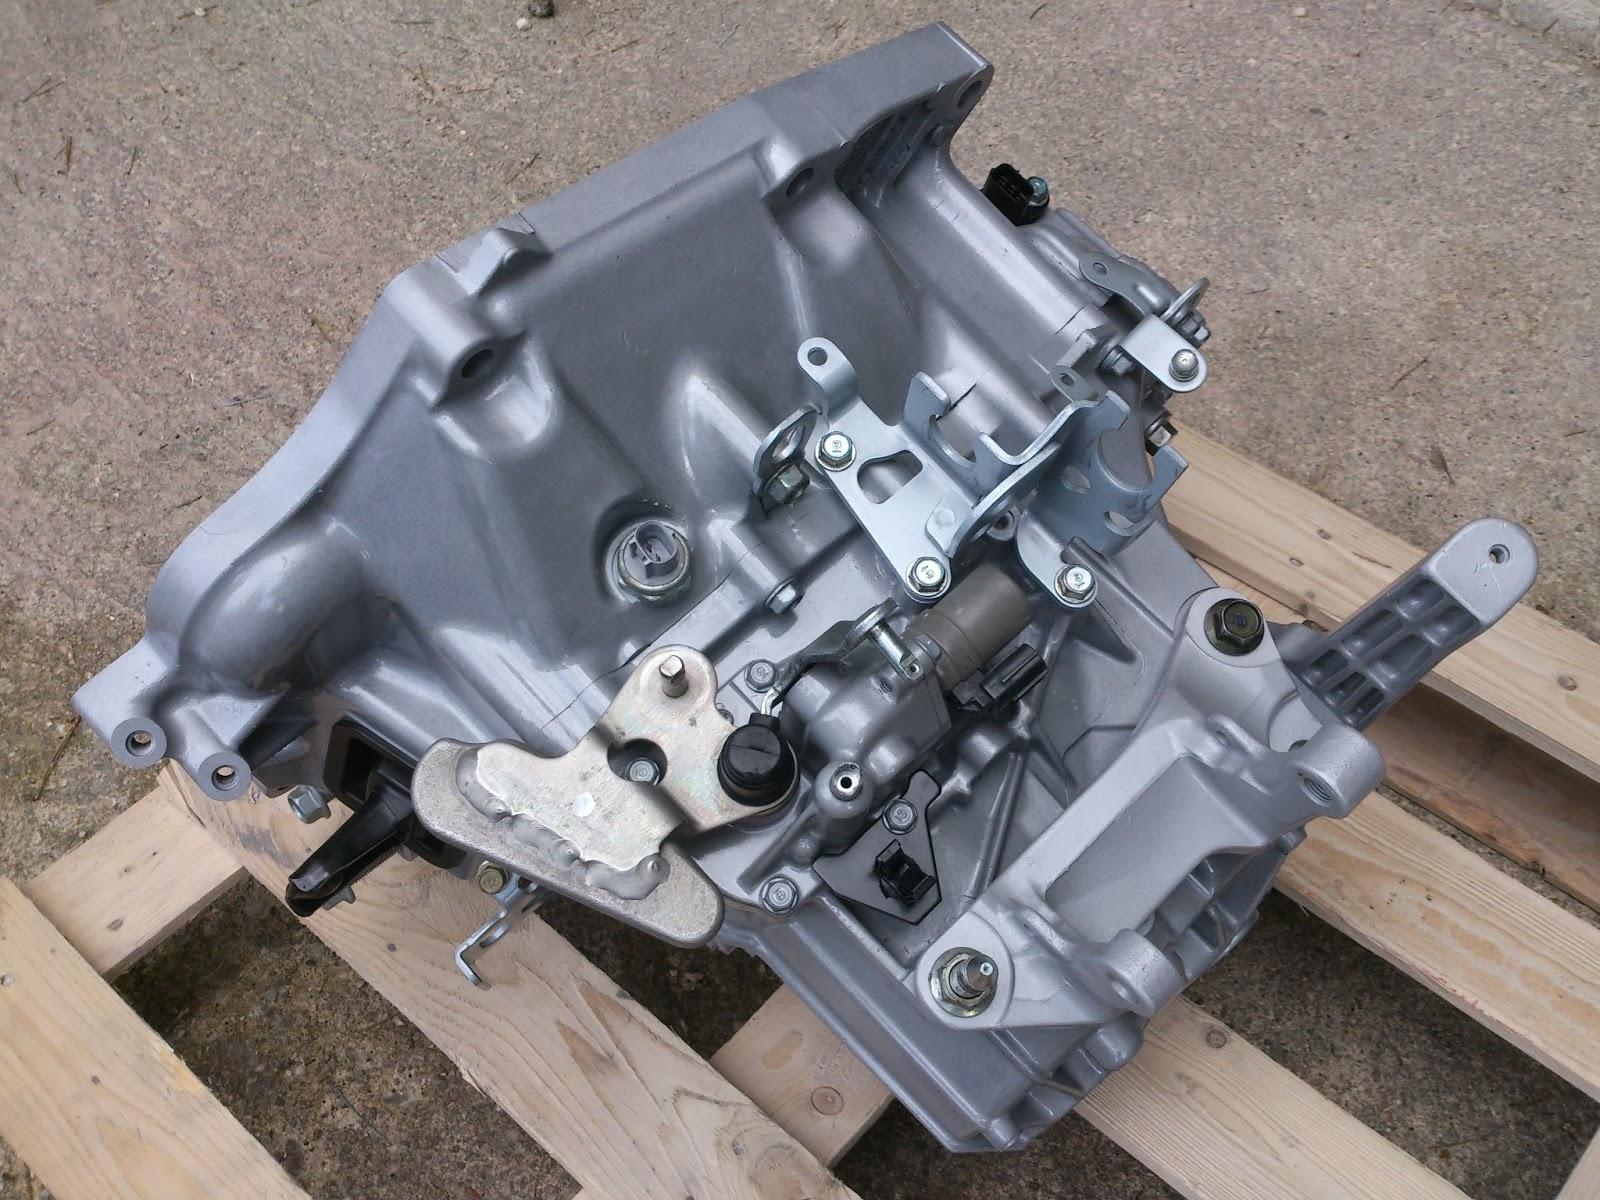 richard engines engineering boite vitesse. Black Bedroom Furniture Sets. Home Design Ideas